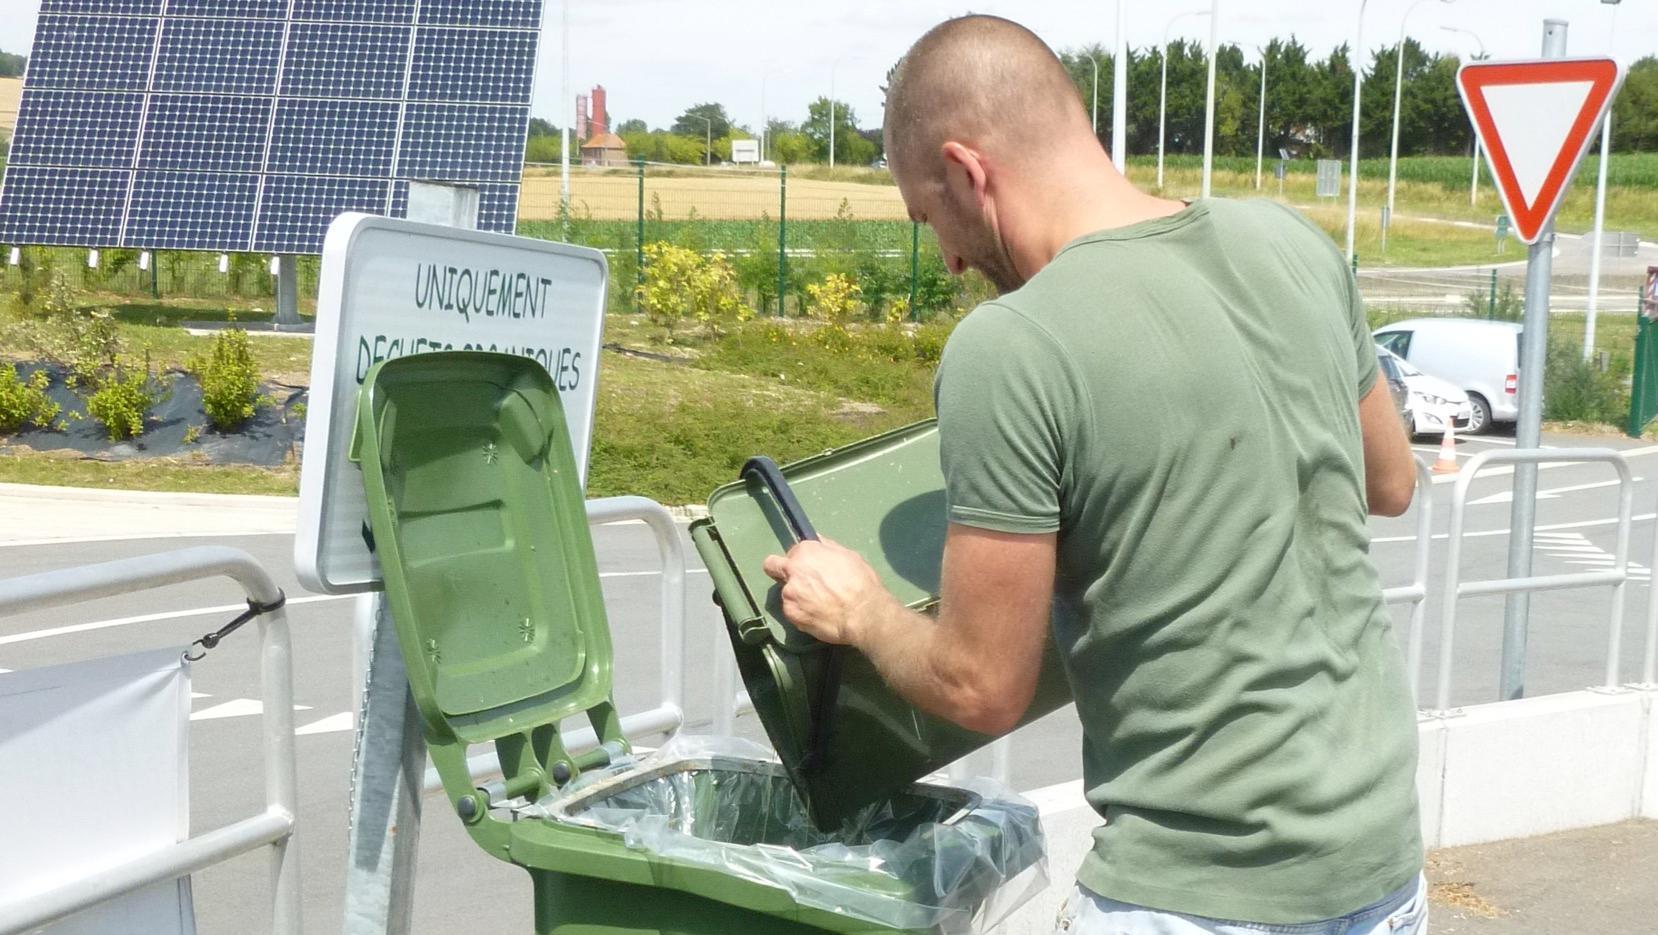 Grève: plusieurs recyparcs inaccessibles ce lundi